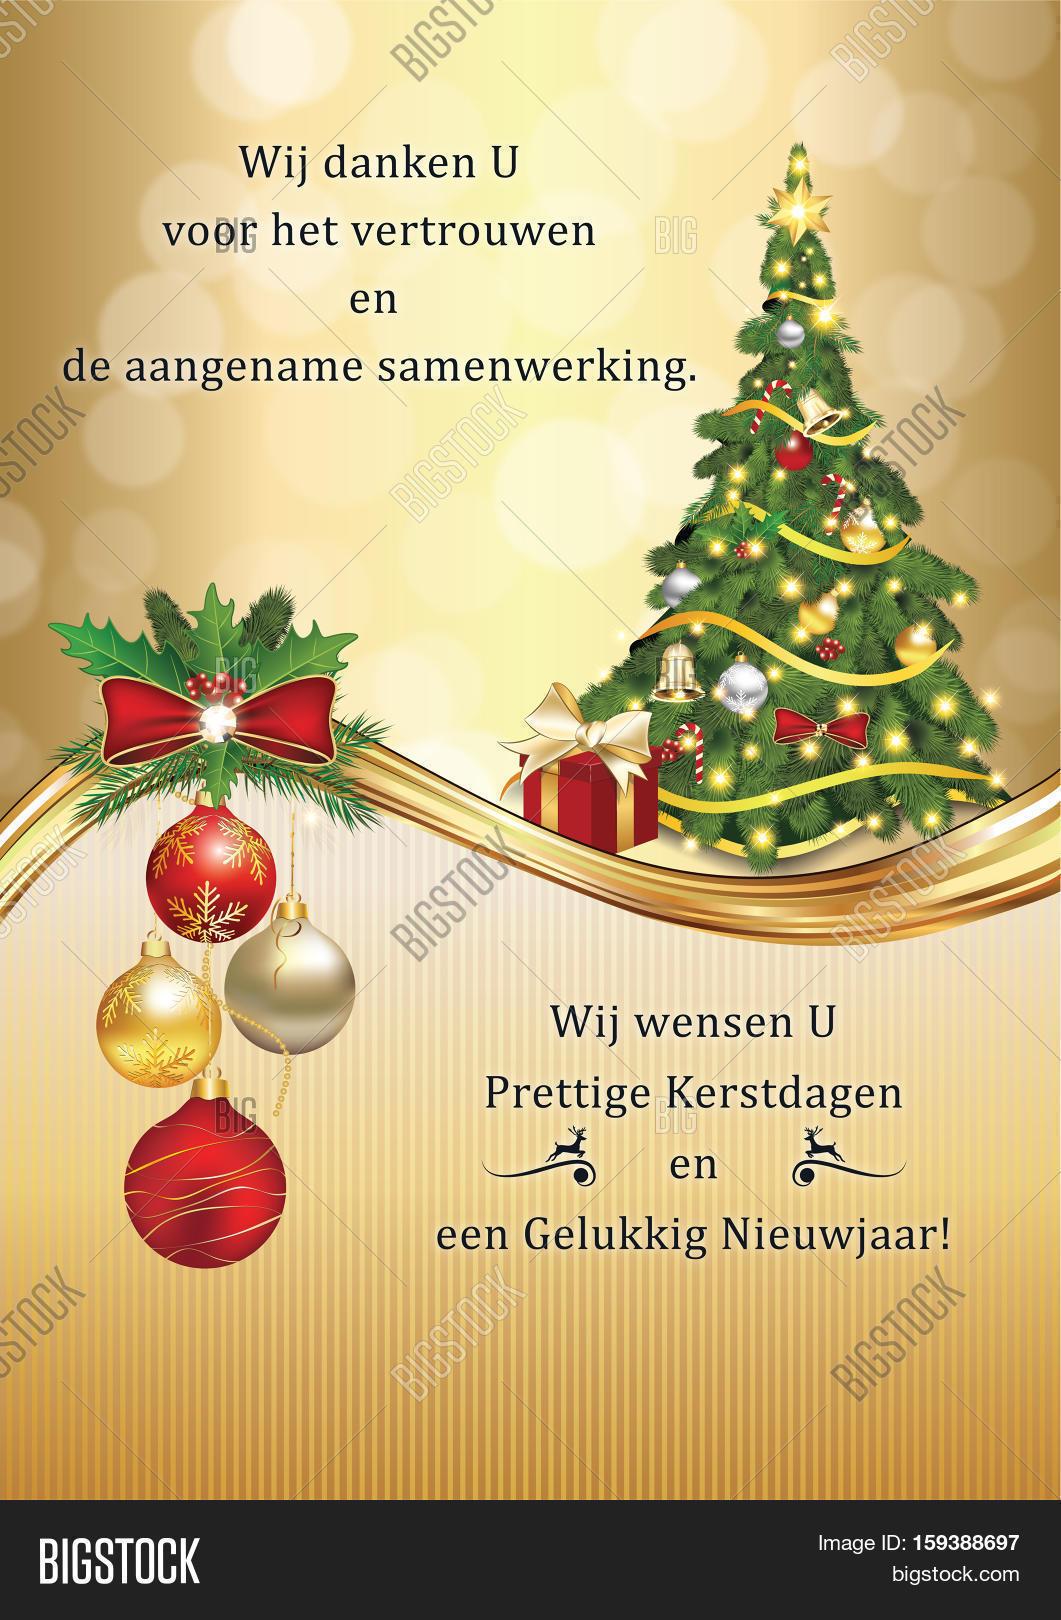 Merry Christmas In Dutch.Business Dutch Image Photo Free Trial Bigstock